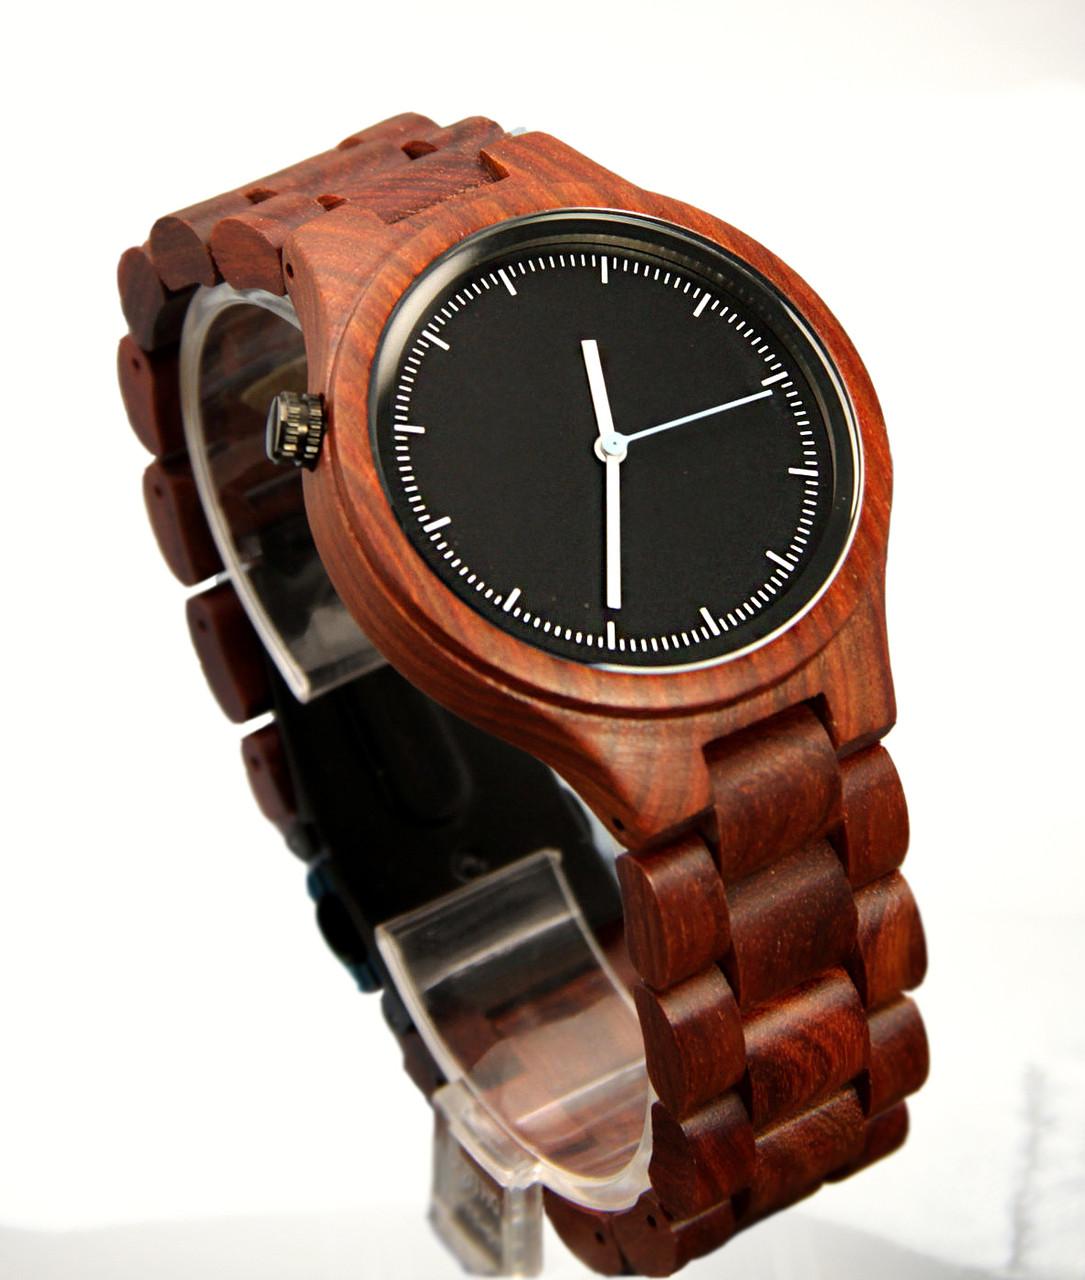 Grpn - Engraved Watch W#93